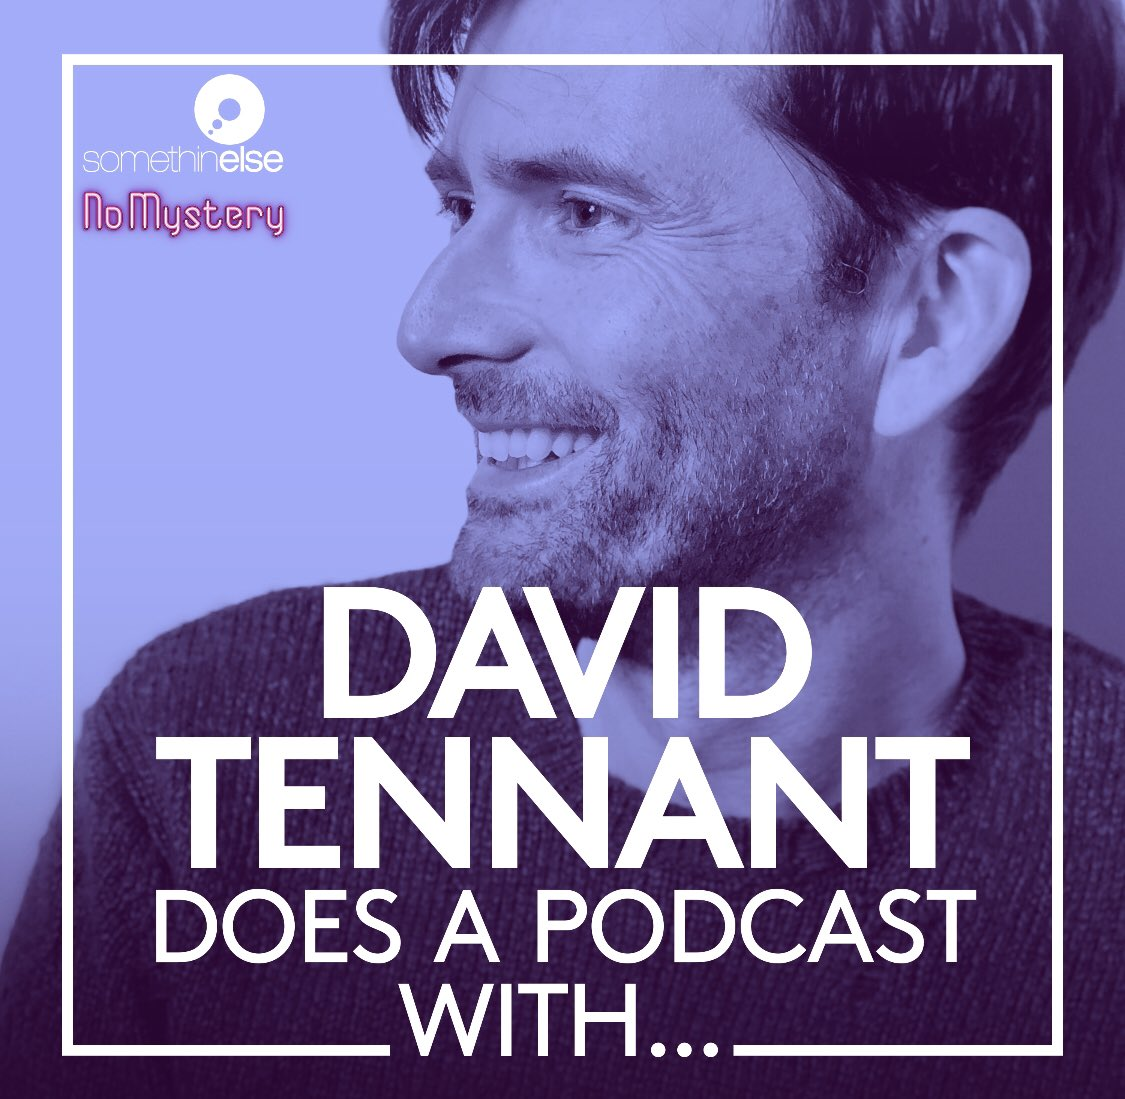 David Tennant's logo